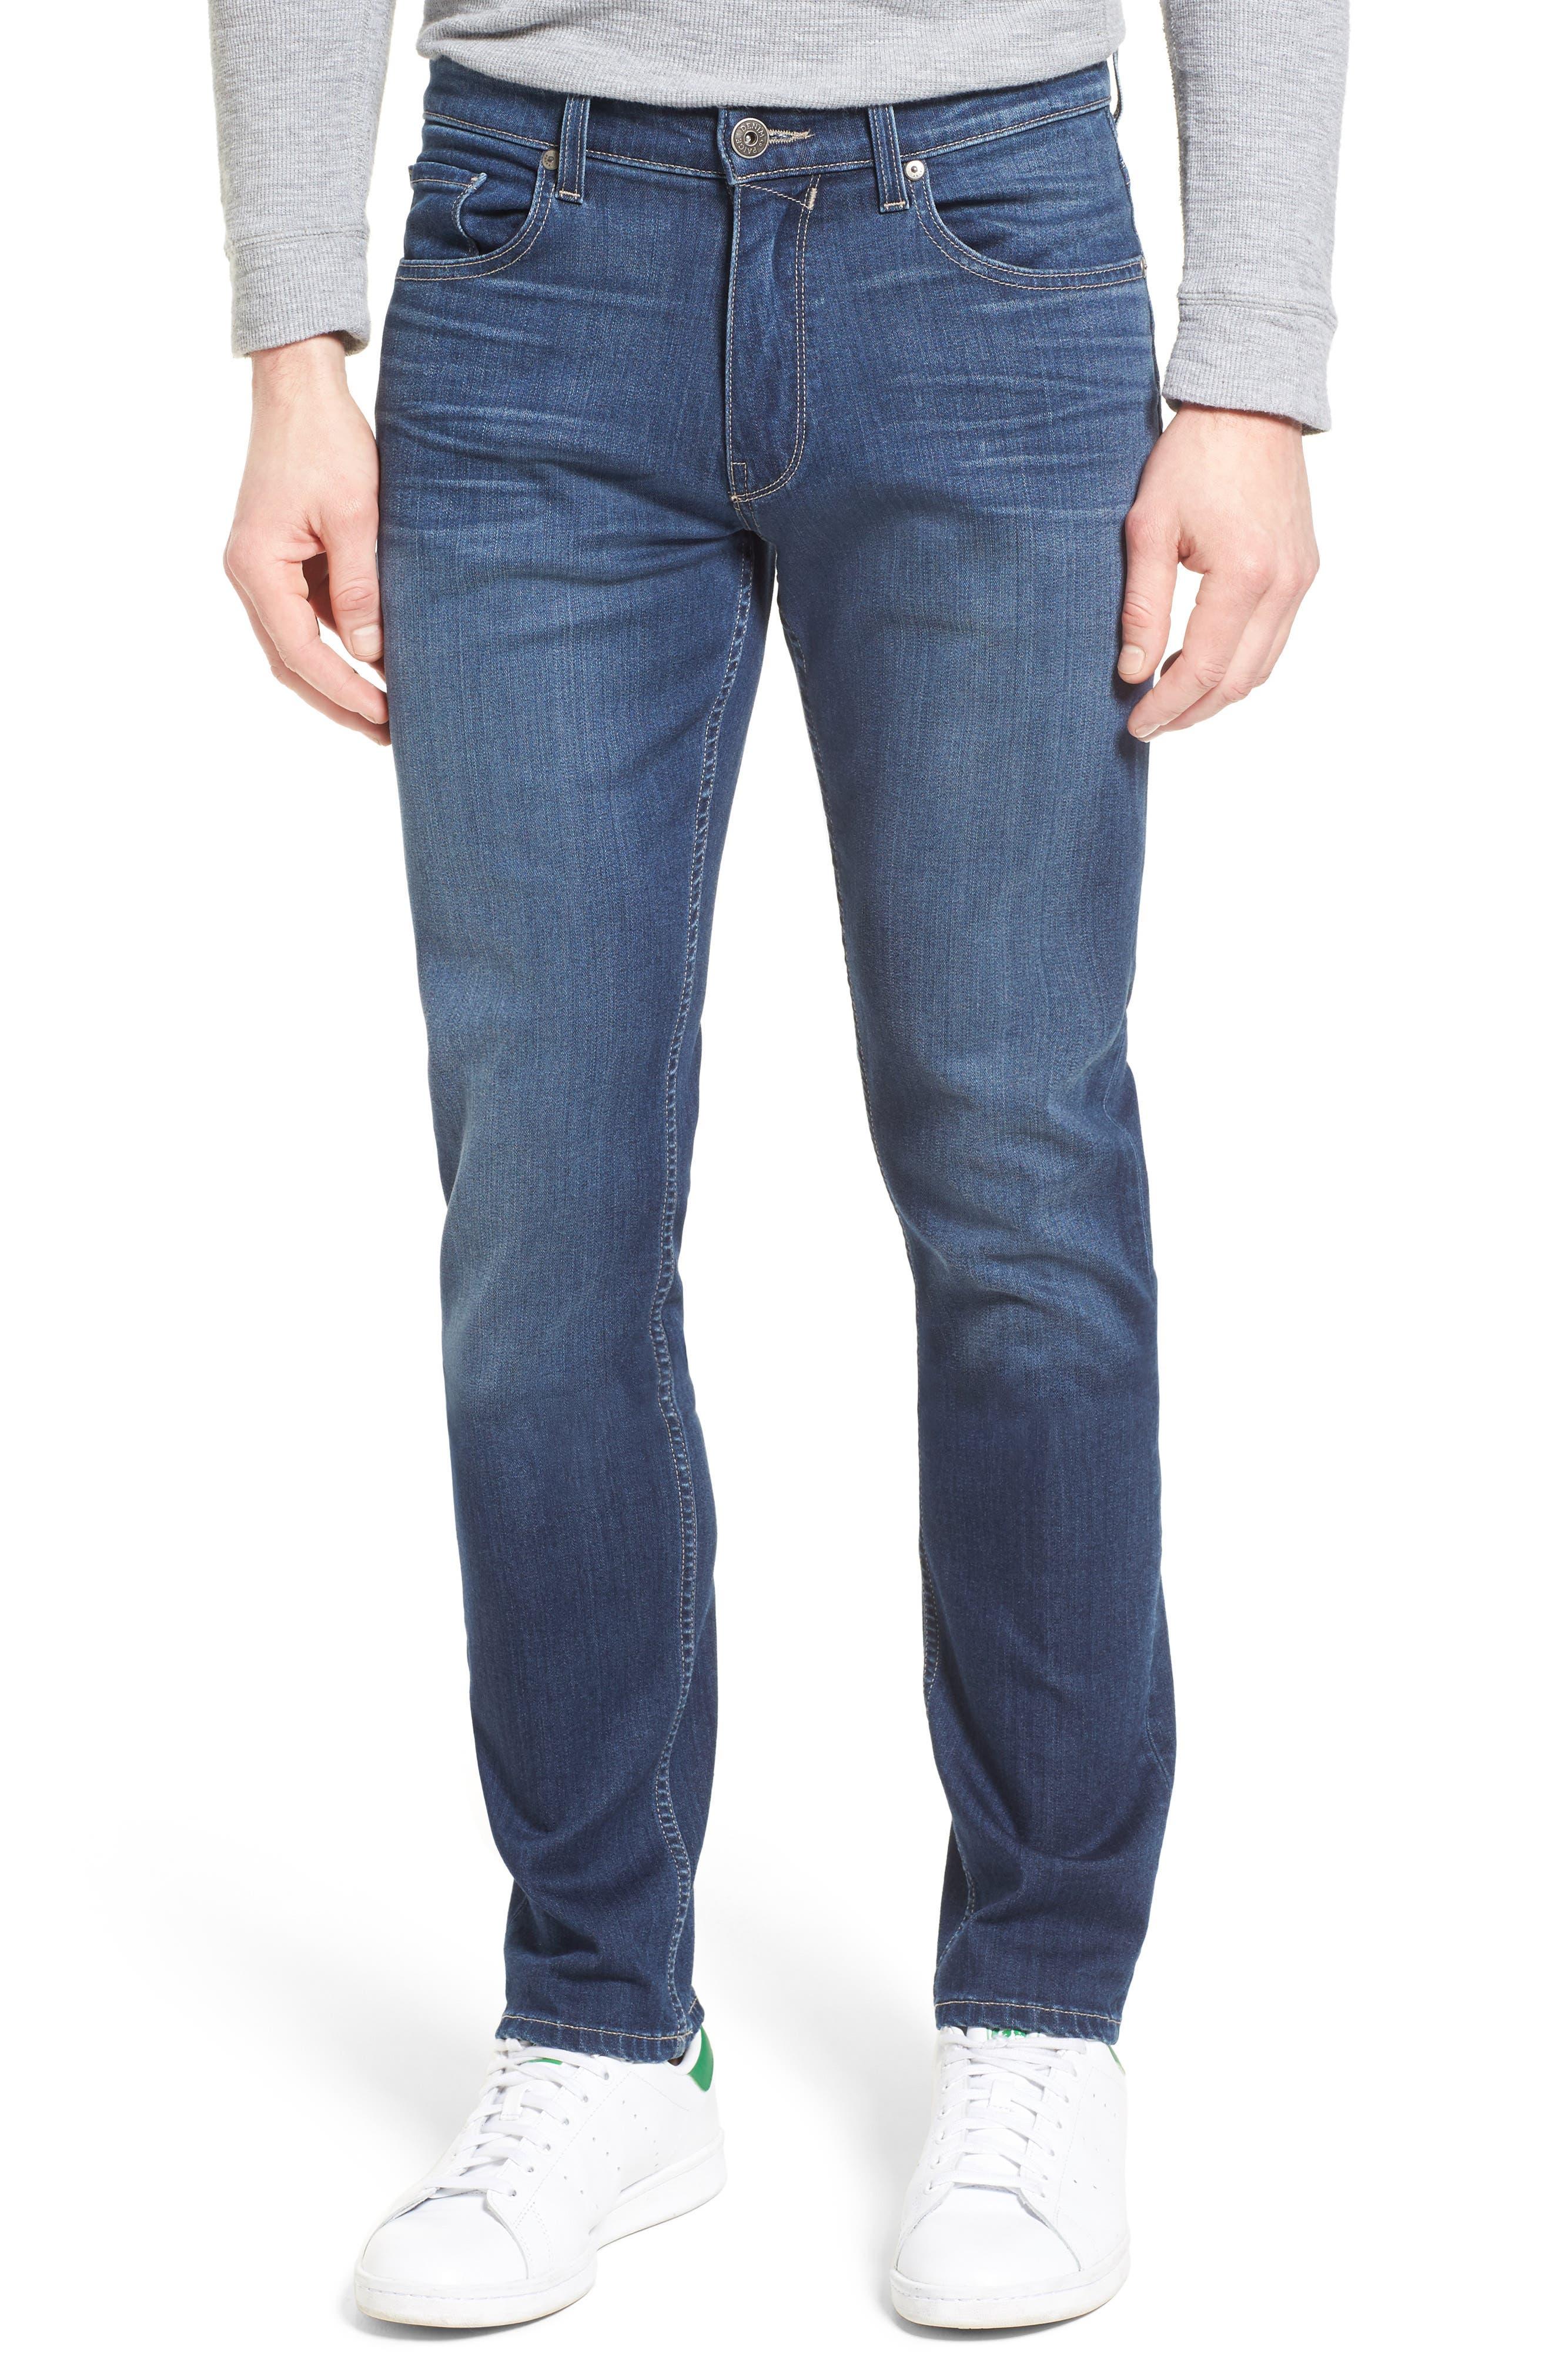 Transcend - Lennox Straight Leg Jeans,                         Main,                         color, Leo